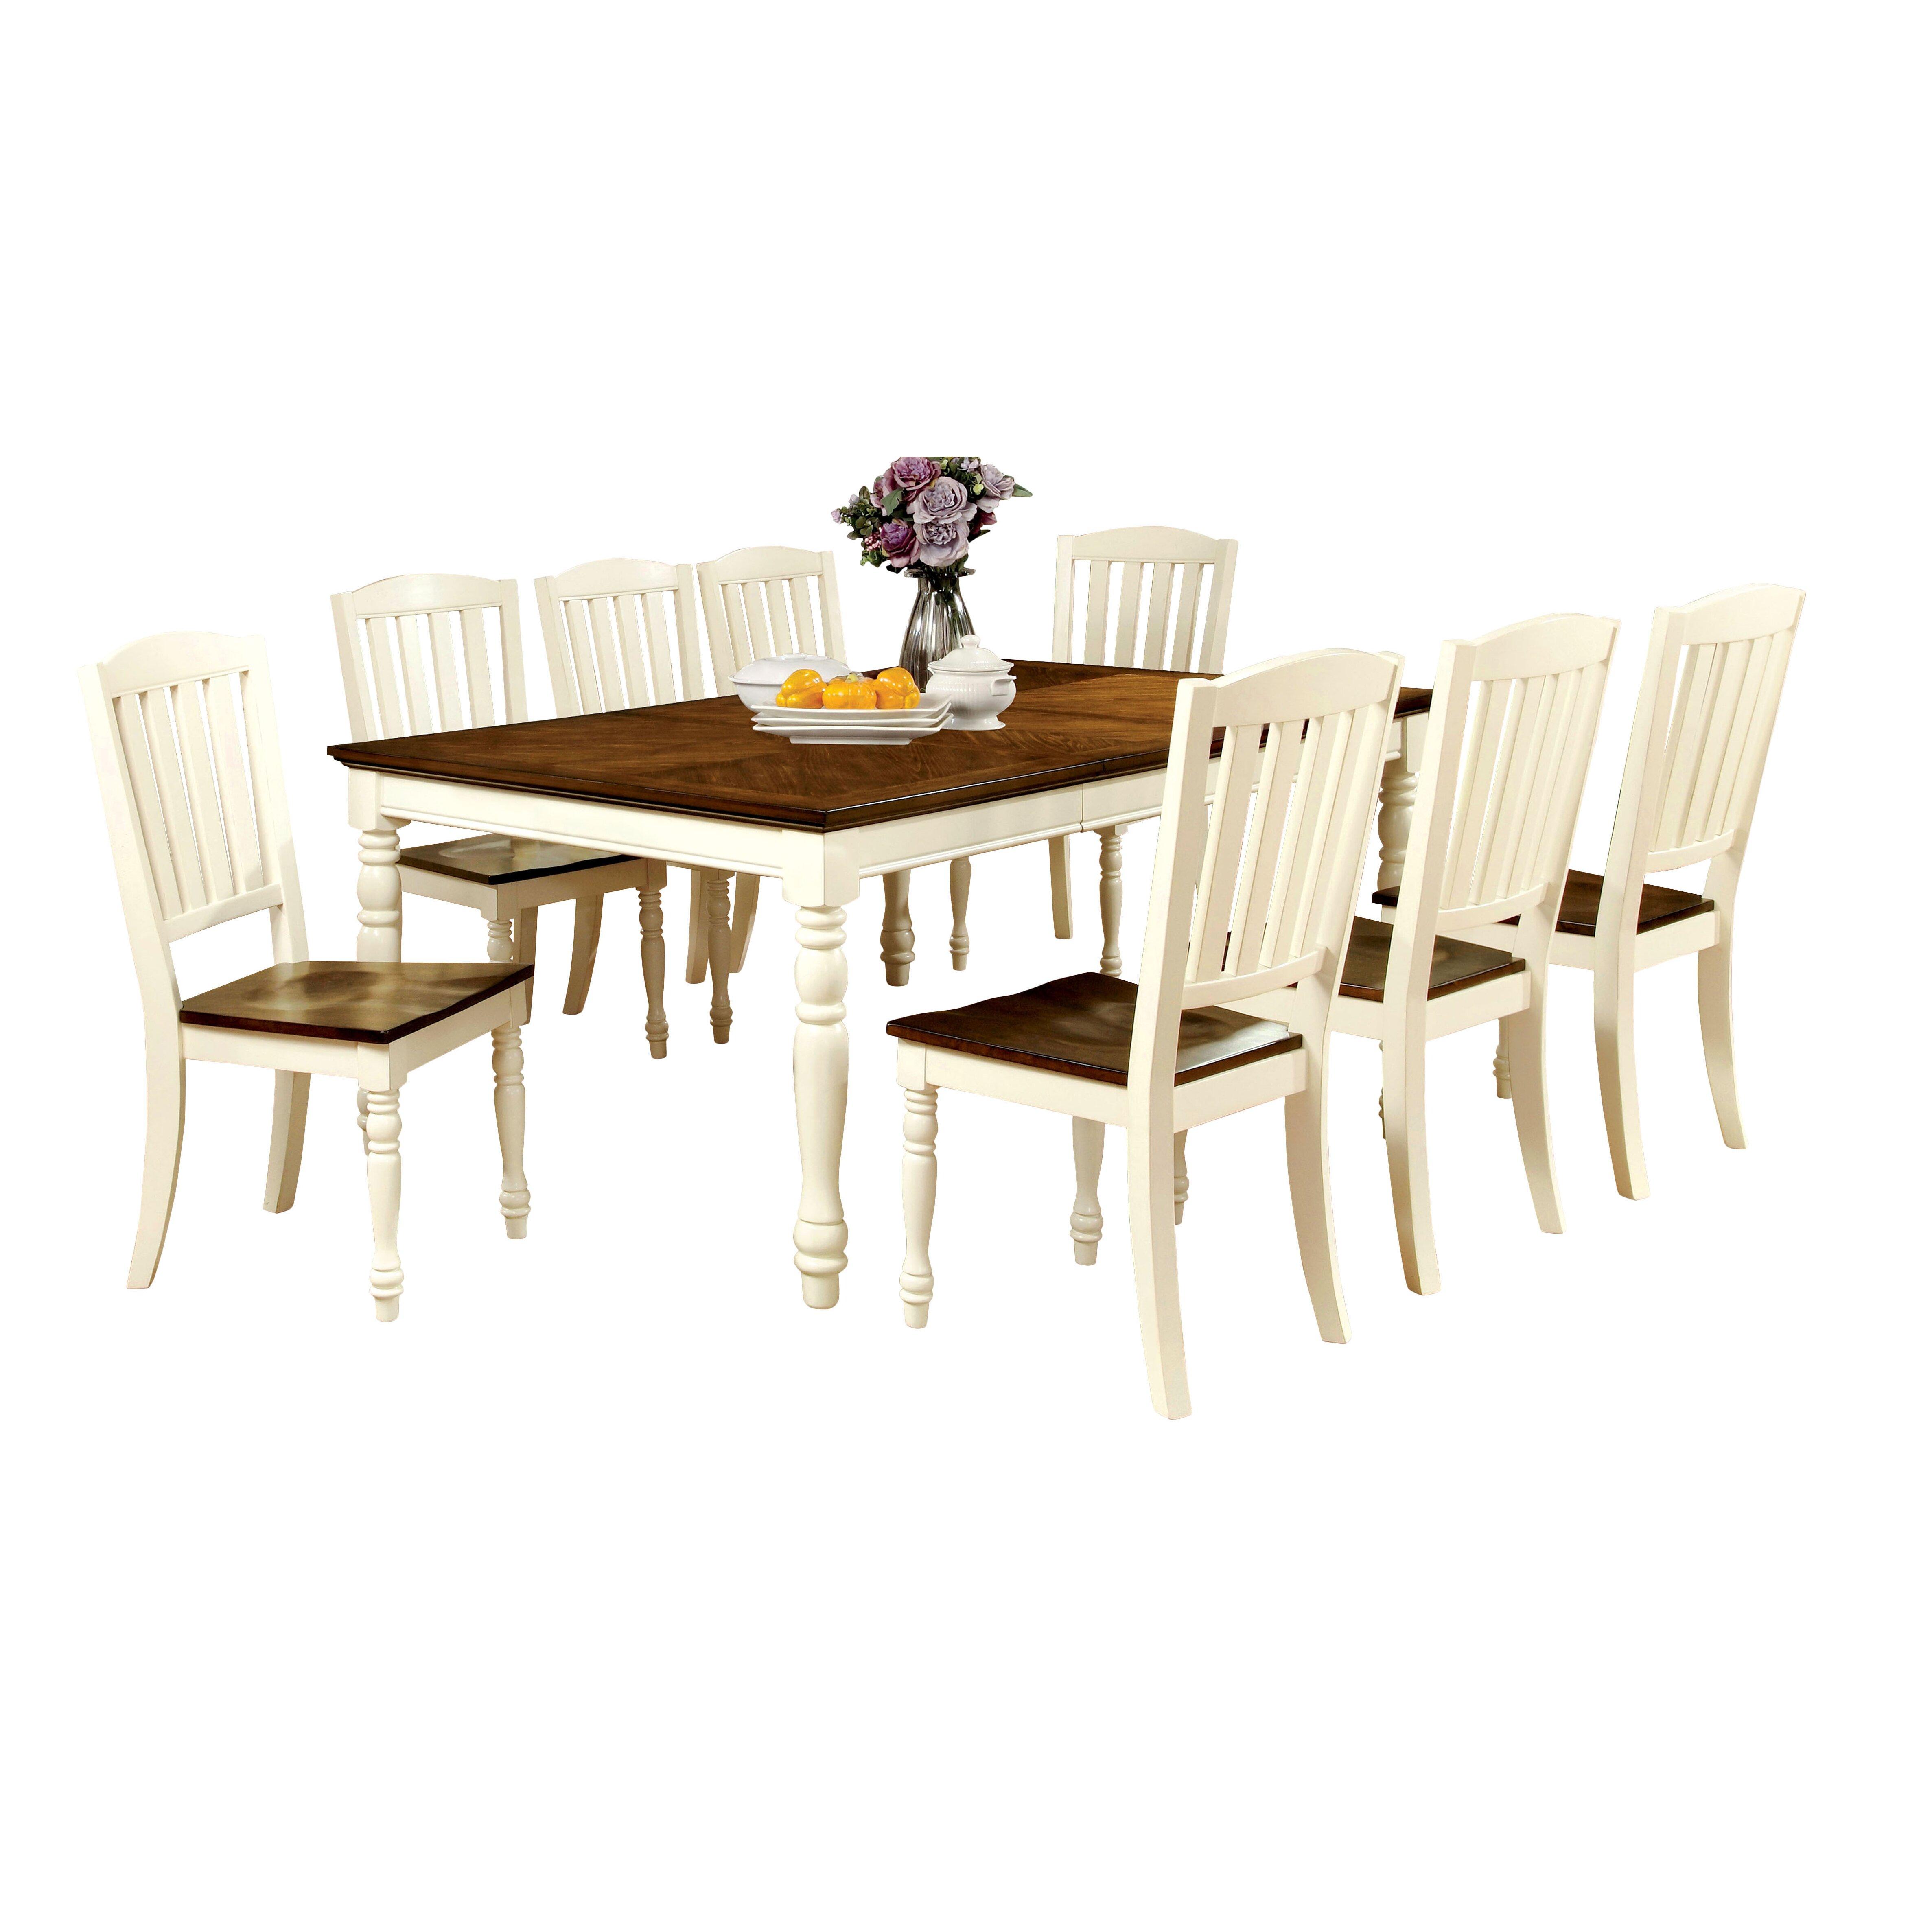 Hokku designs laureus 9 piece dining set reviews for Hokku designs dining room furniture